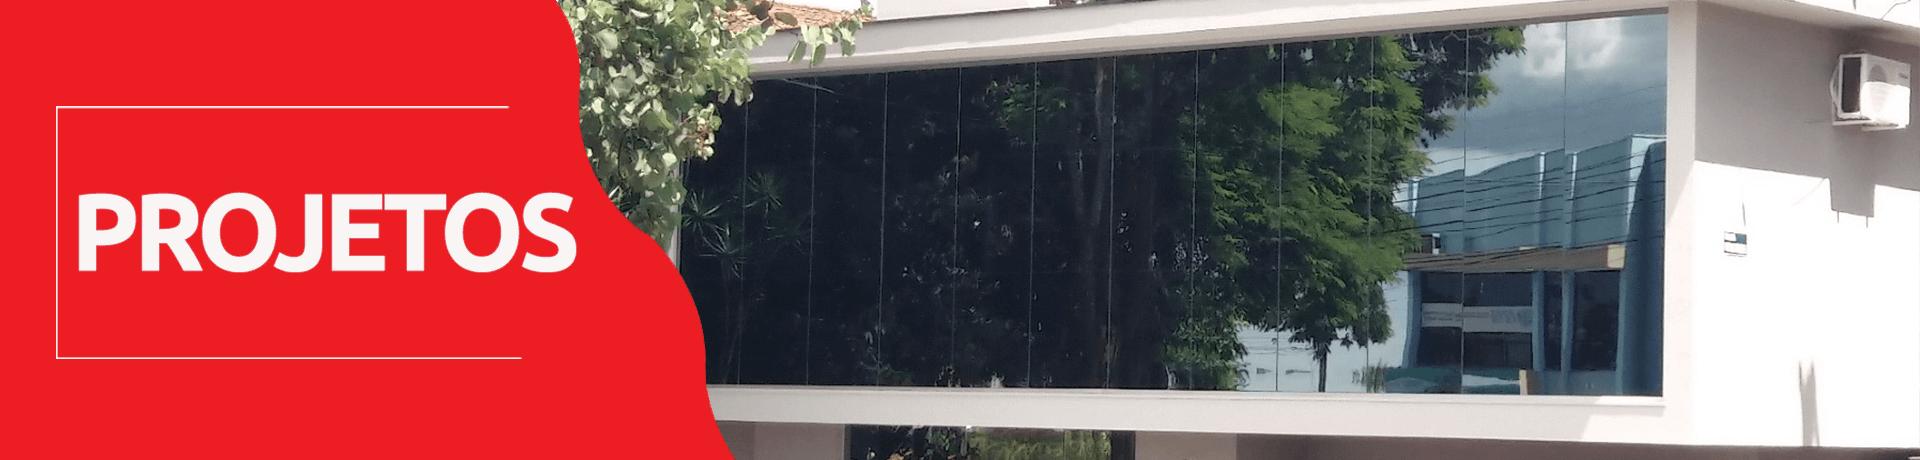 banner-vitrine-projetos